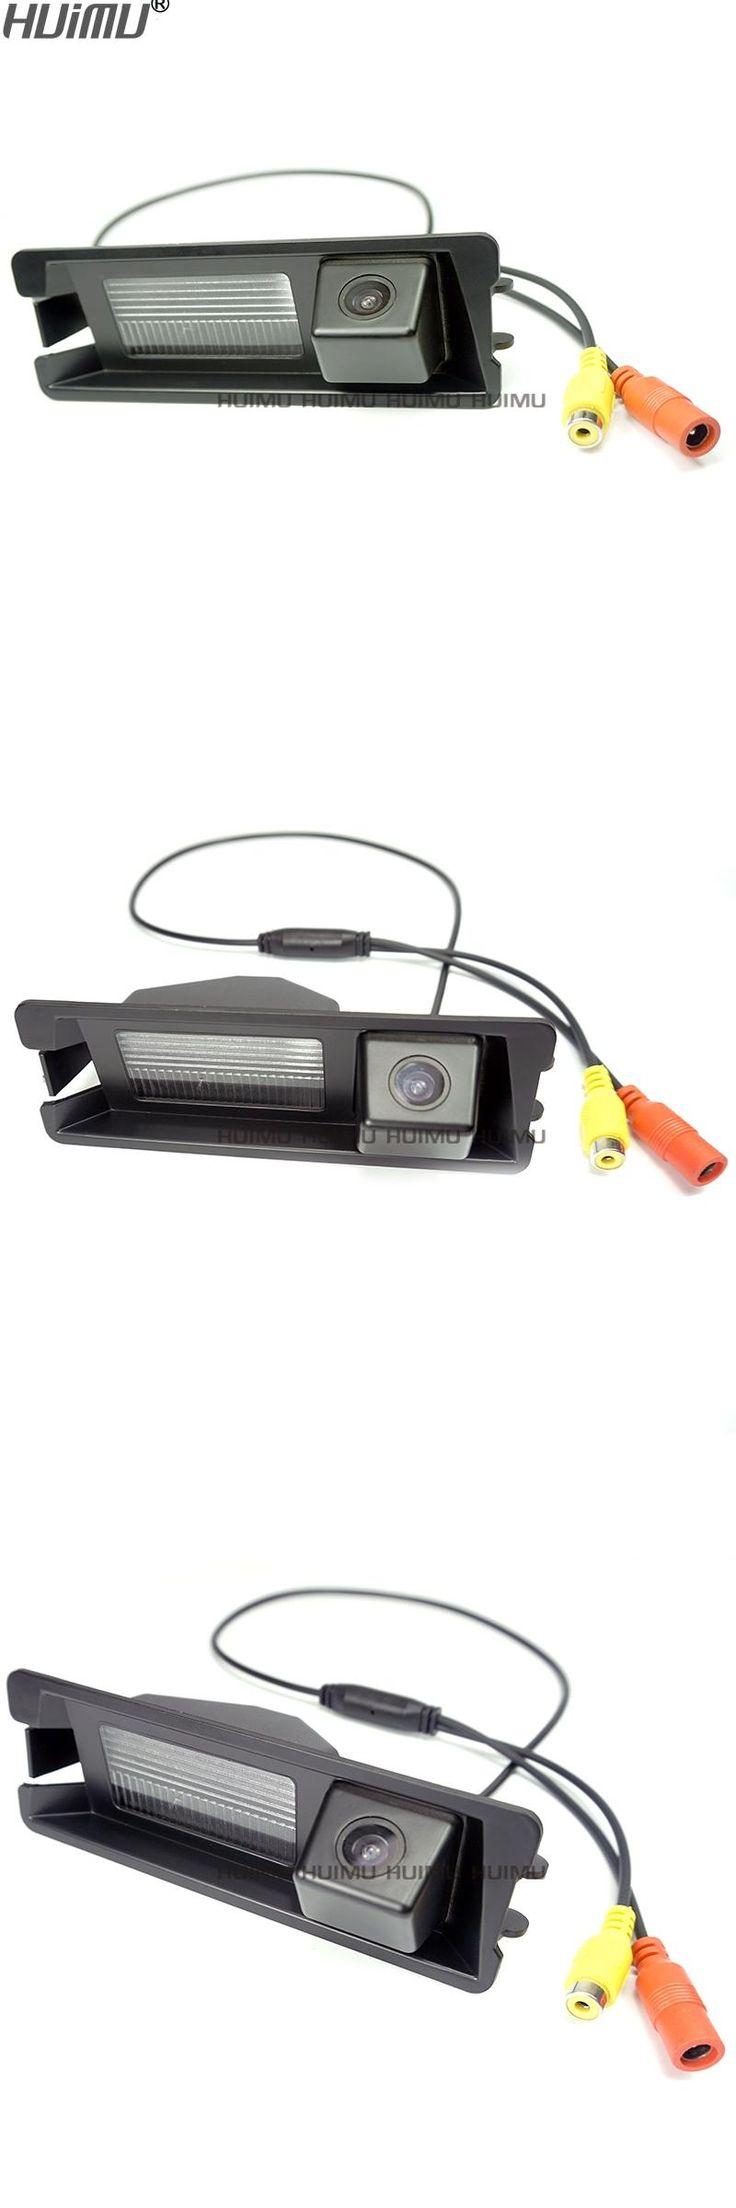 [Visit to Buy] Car Rear Reverse backup Camera for SONY ccd Nissan March Renault Logan Renault Sandero dacia Sander Stepway camera night vision #Advertisement